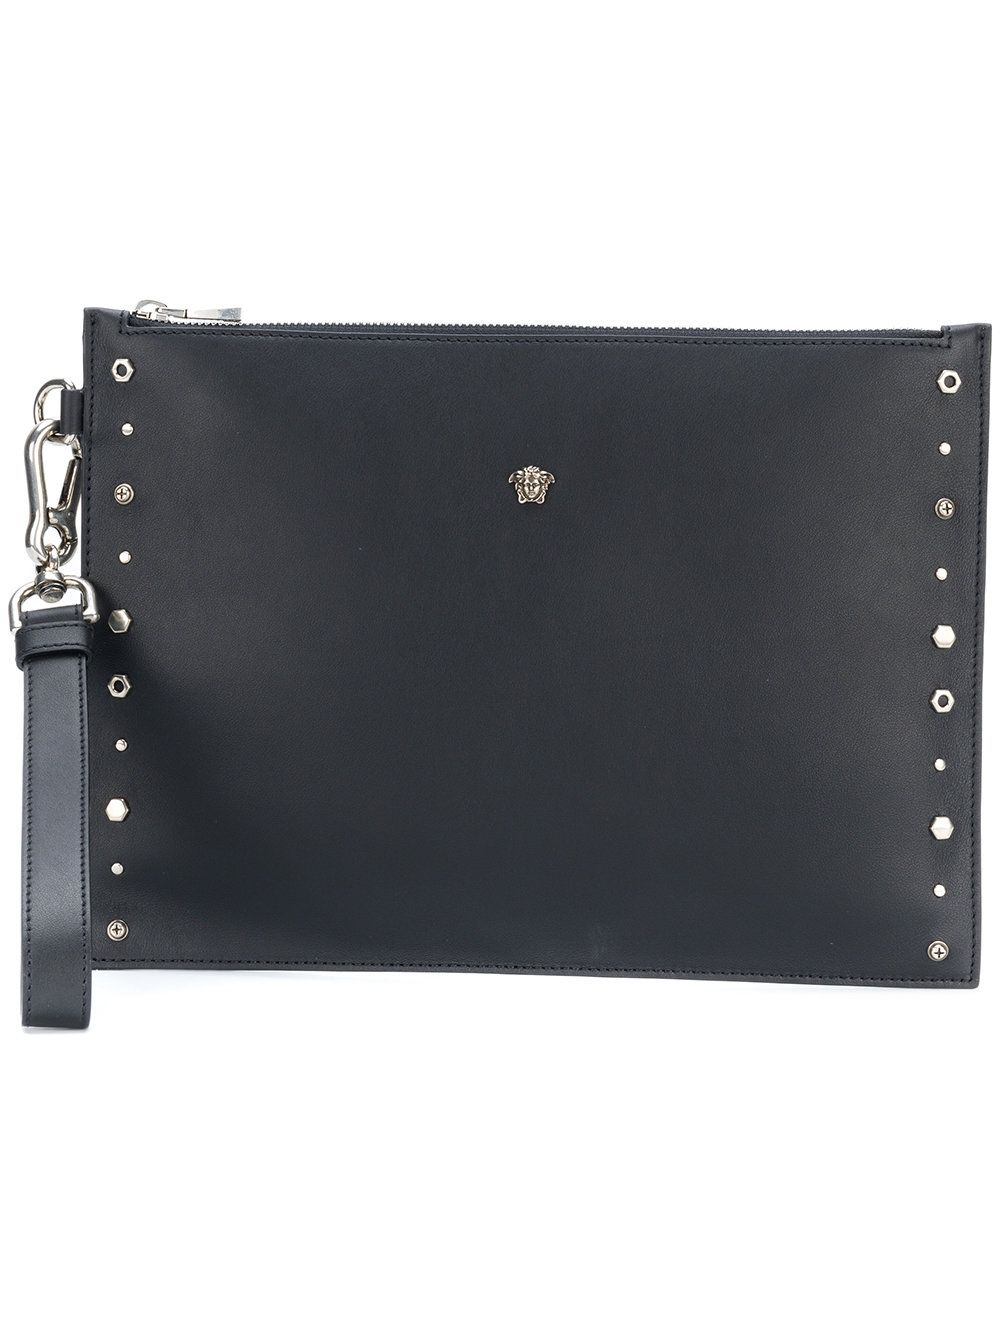 6fe79c7105a2 VERSACE BLACK.  versace  bags  shoulder bags  clutch  leather  hand ...